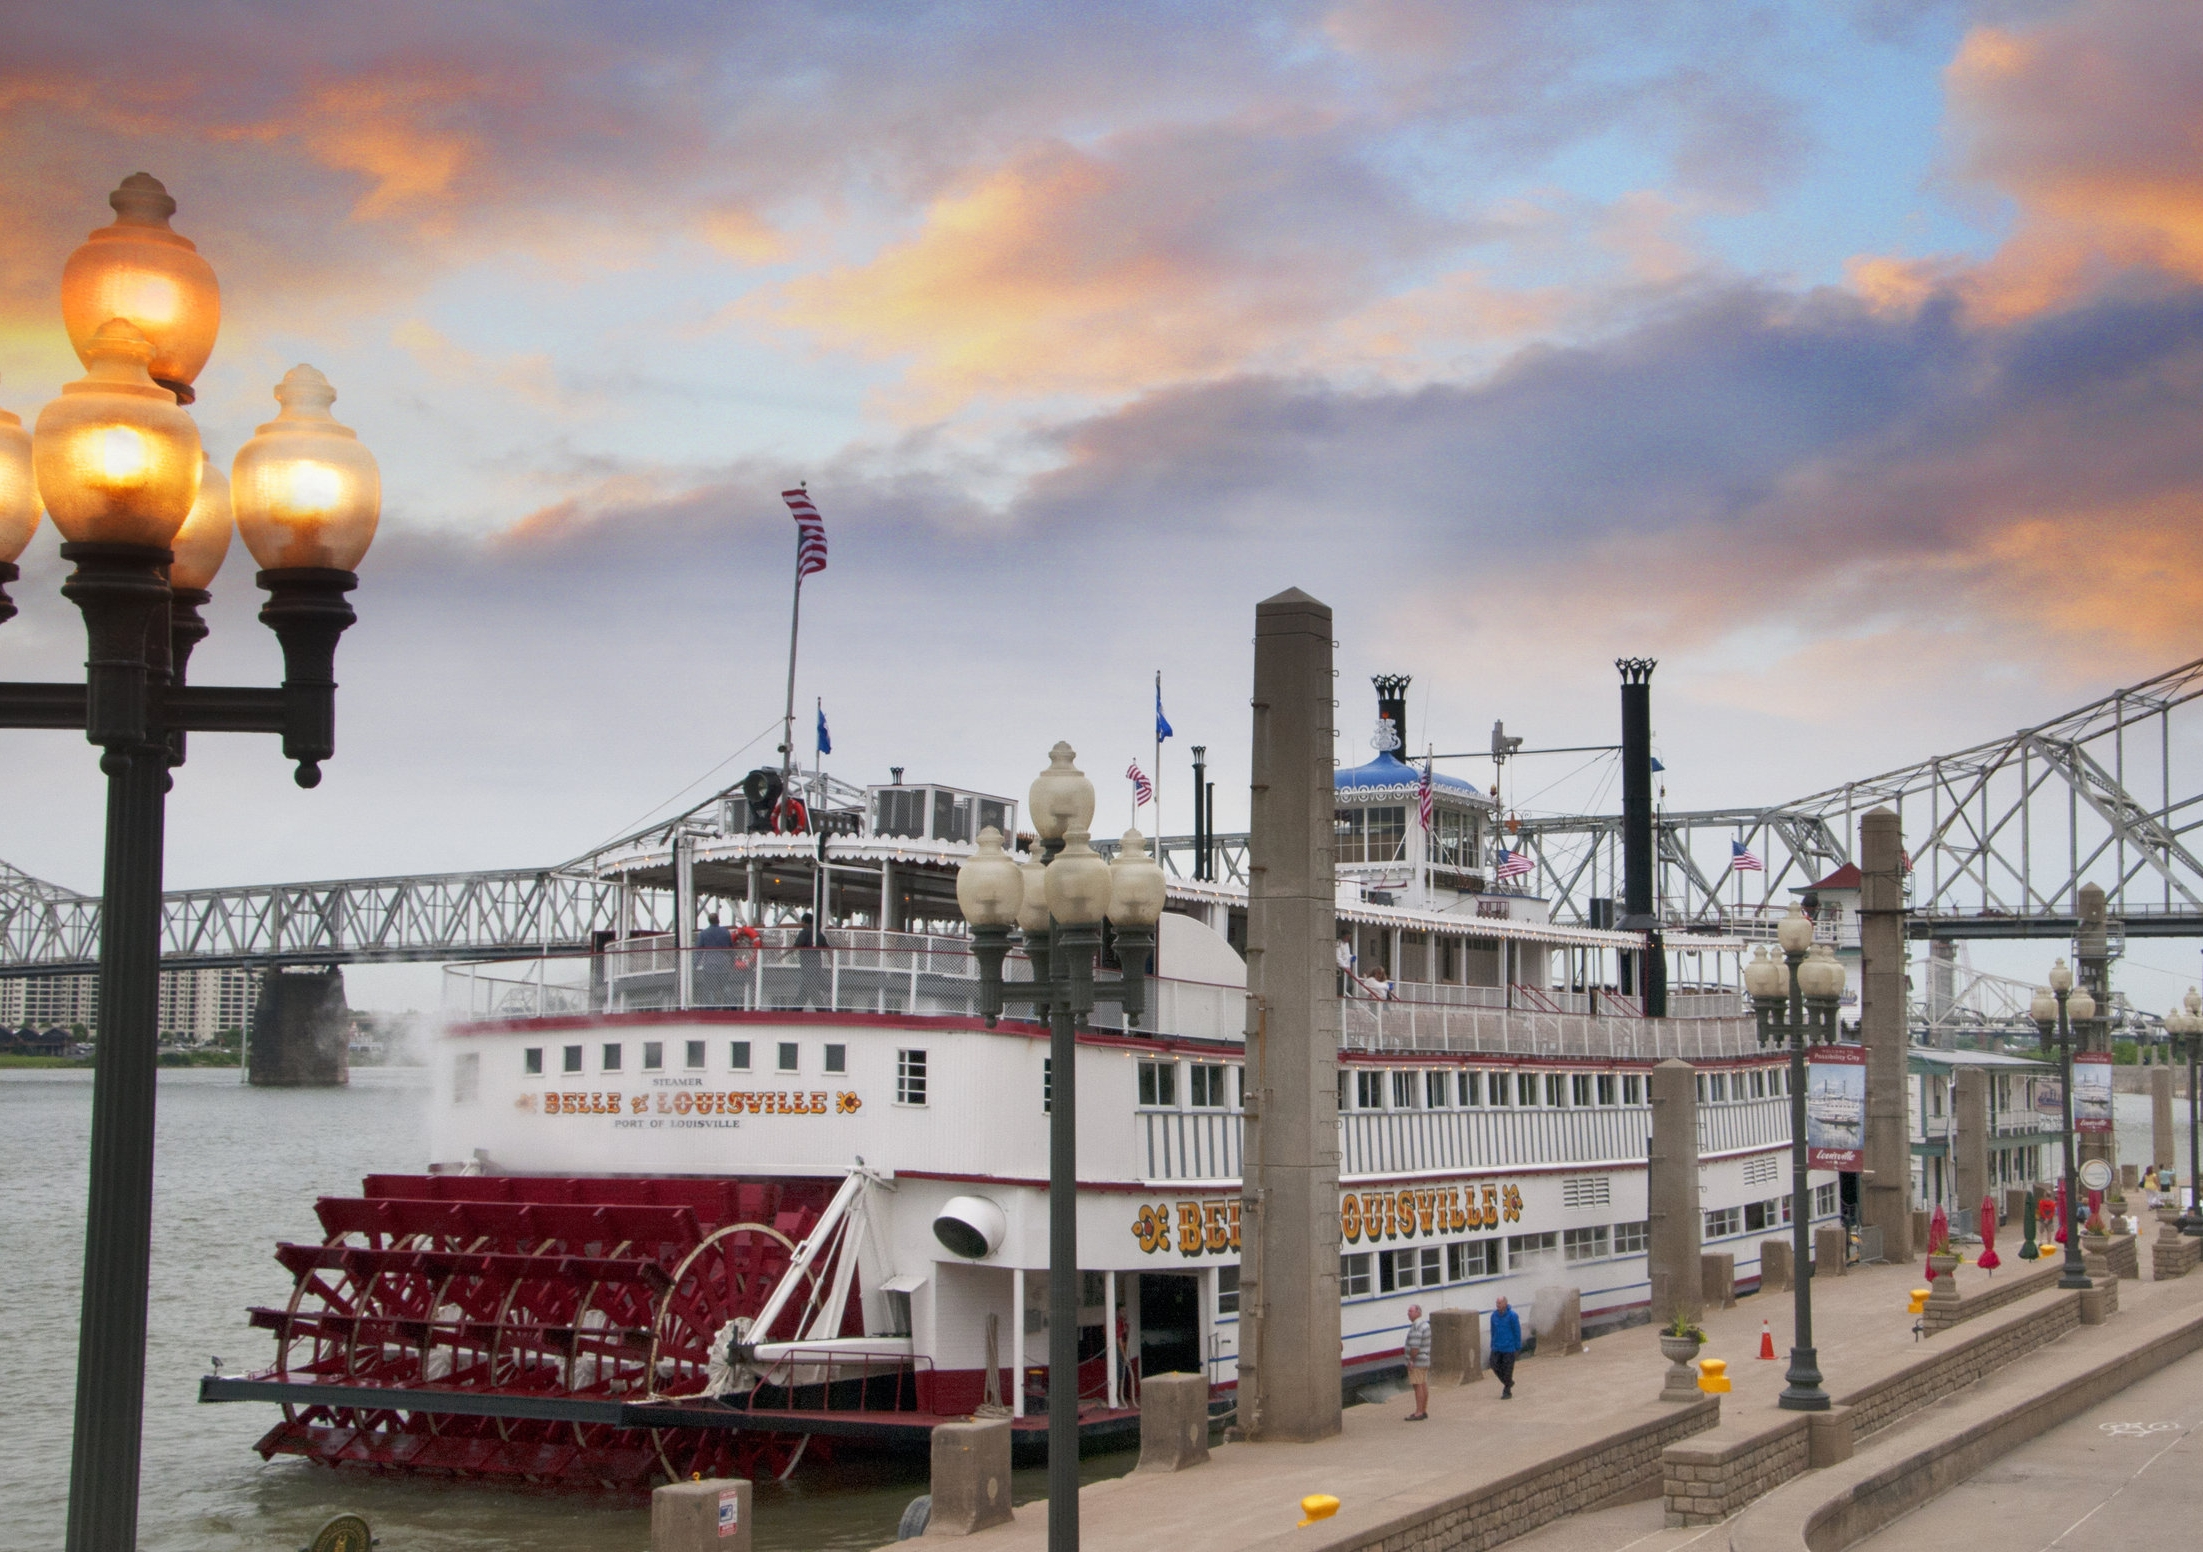 Louisville-45271719_xxl-Paddlesteamer-Riverboat-on-the-River-Ohio-in-Louisville-Kentucky.jpg